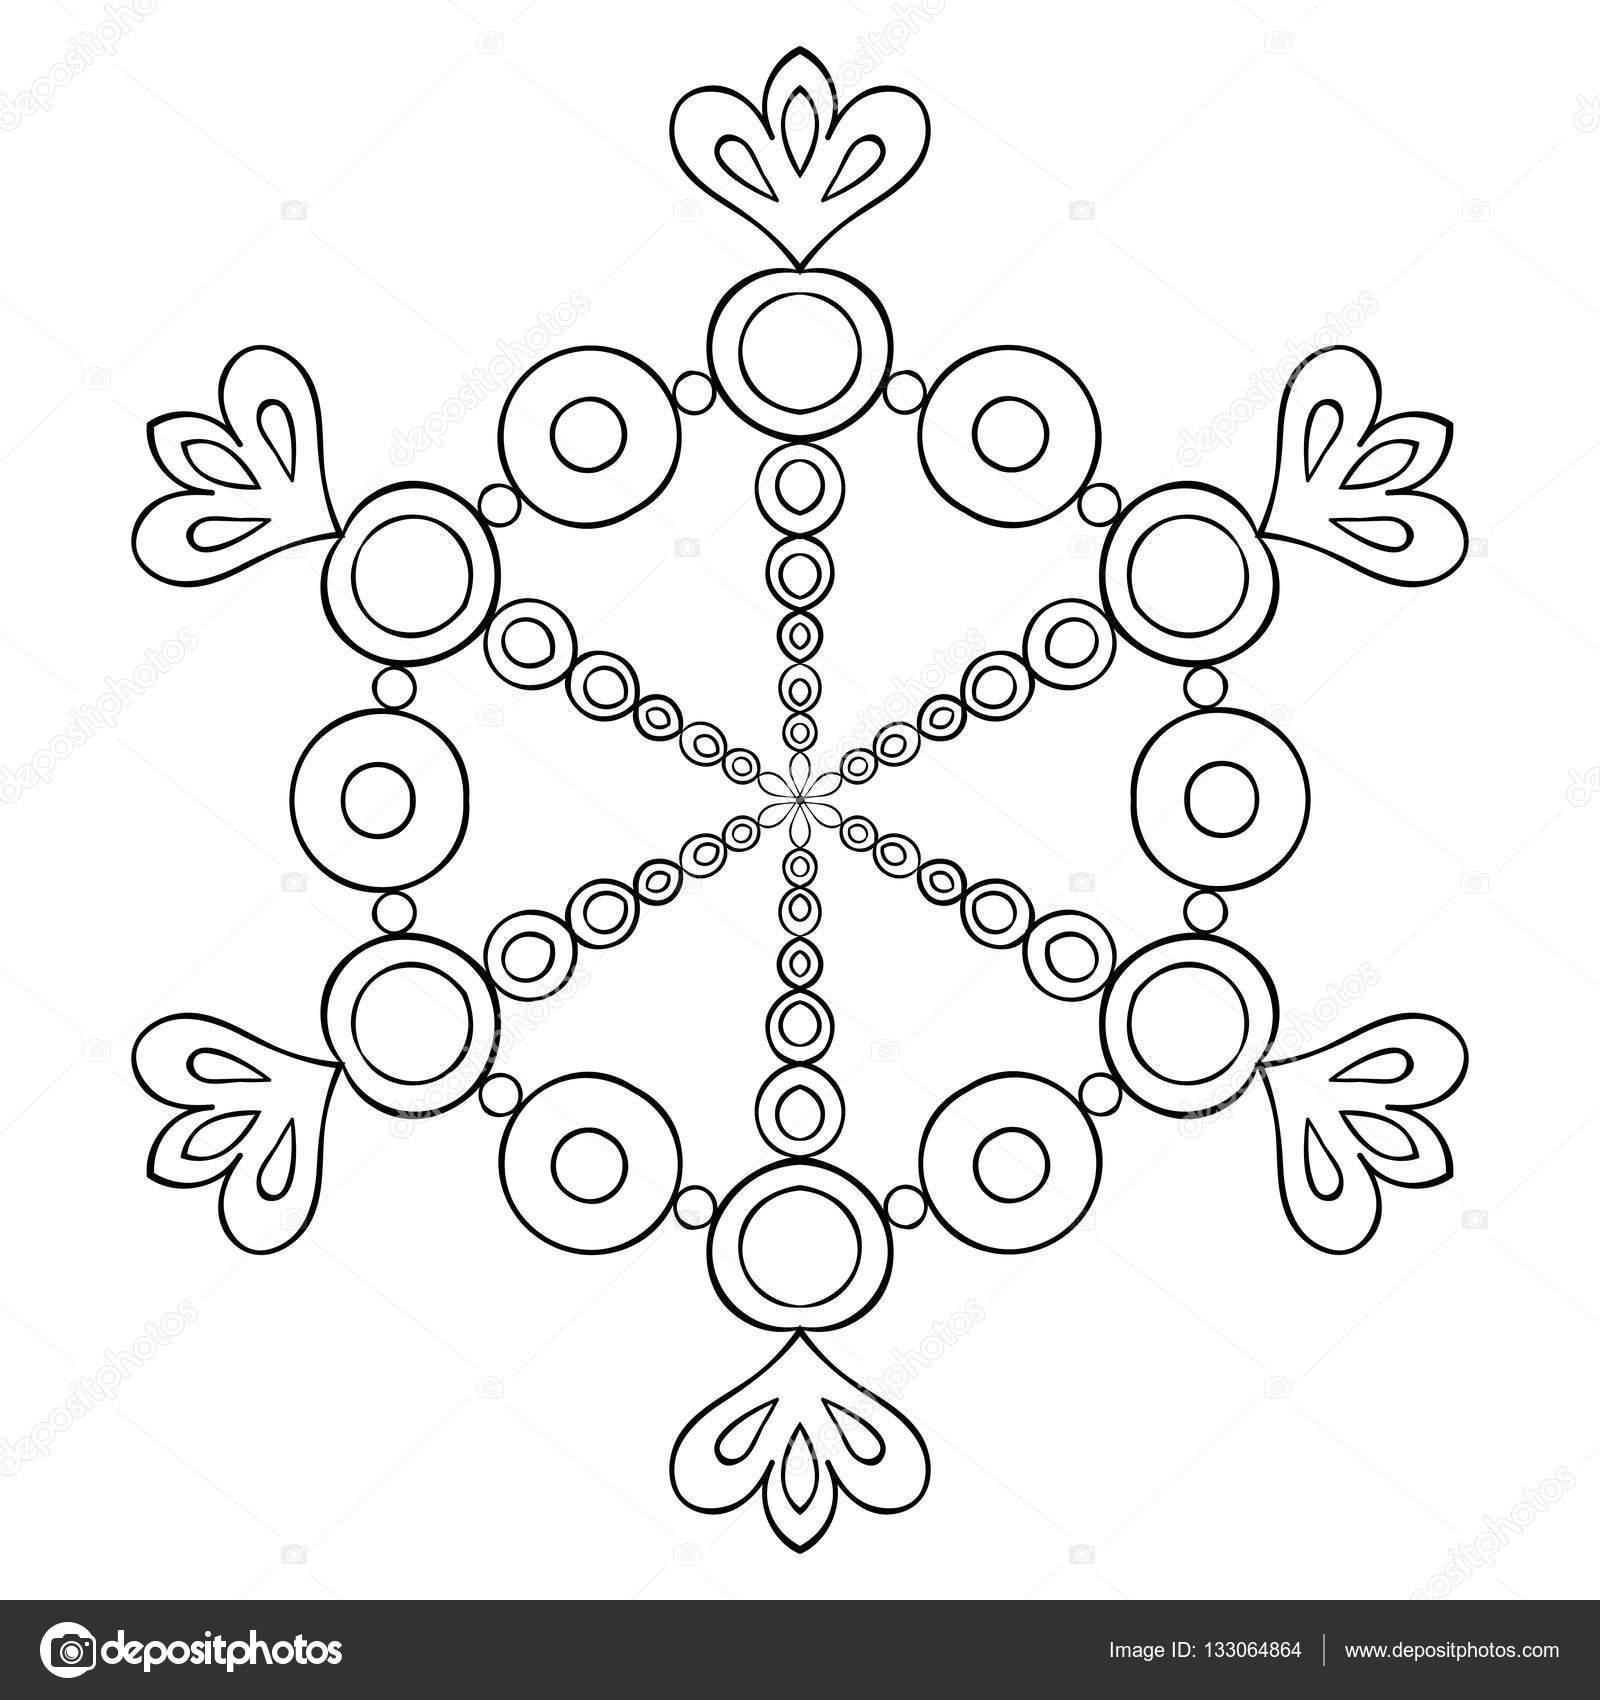 Vector Papier Knipsel Sneeuwvlok In Zentangle Stijl Zwarte Mandala